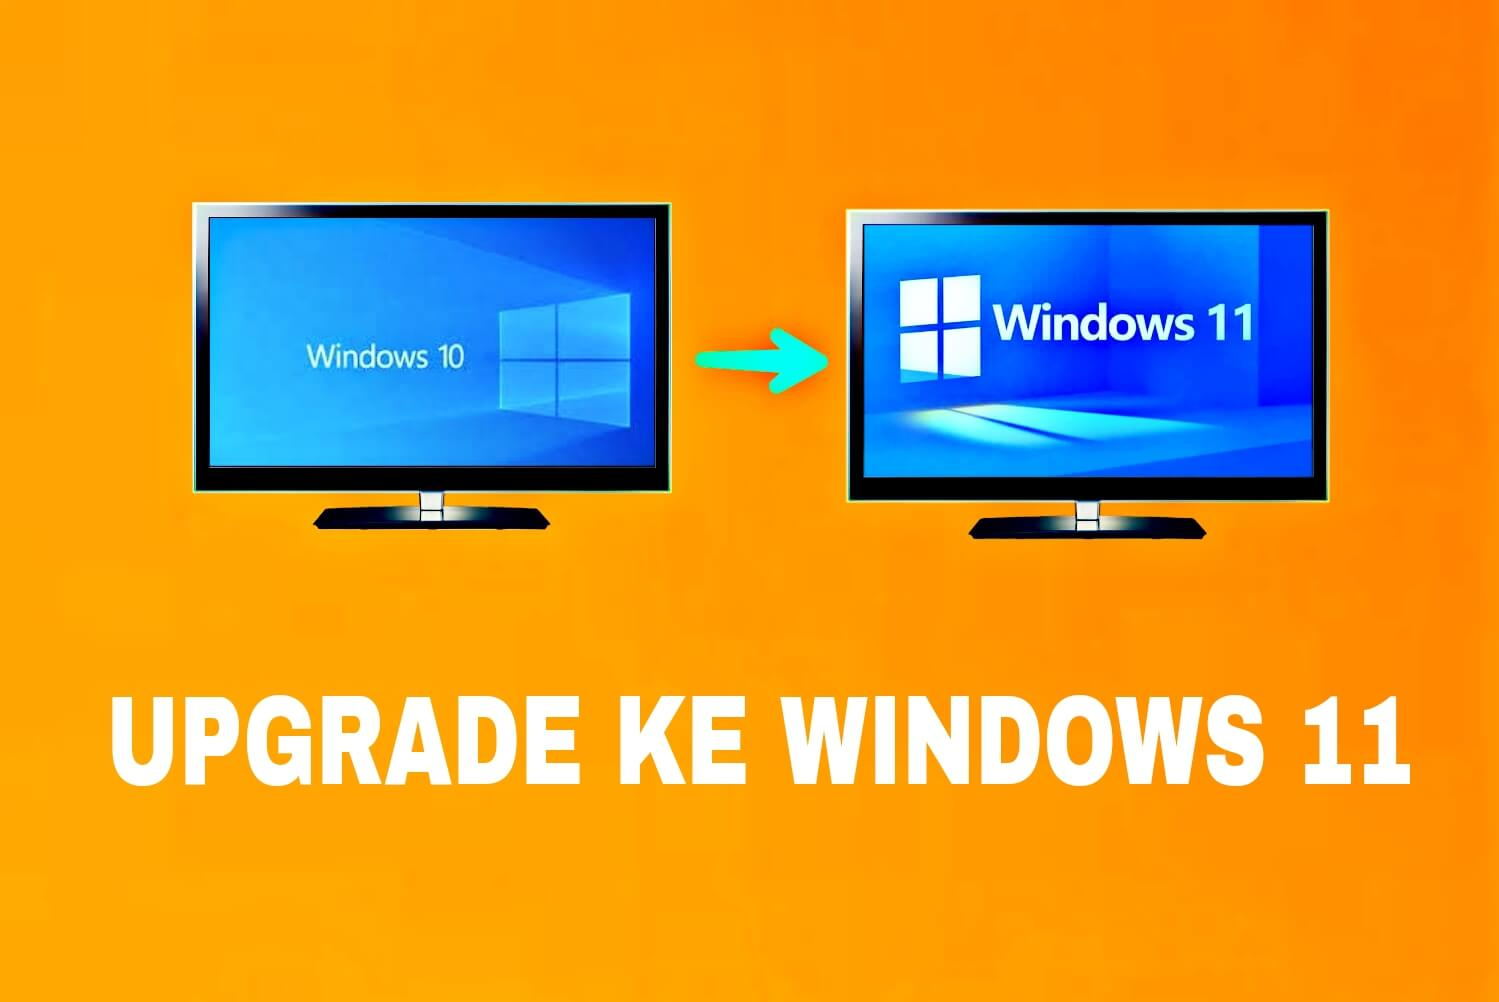 Upgrade dari windows 10 ke windows 11